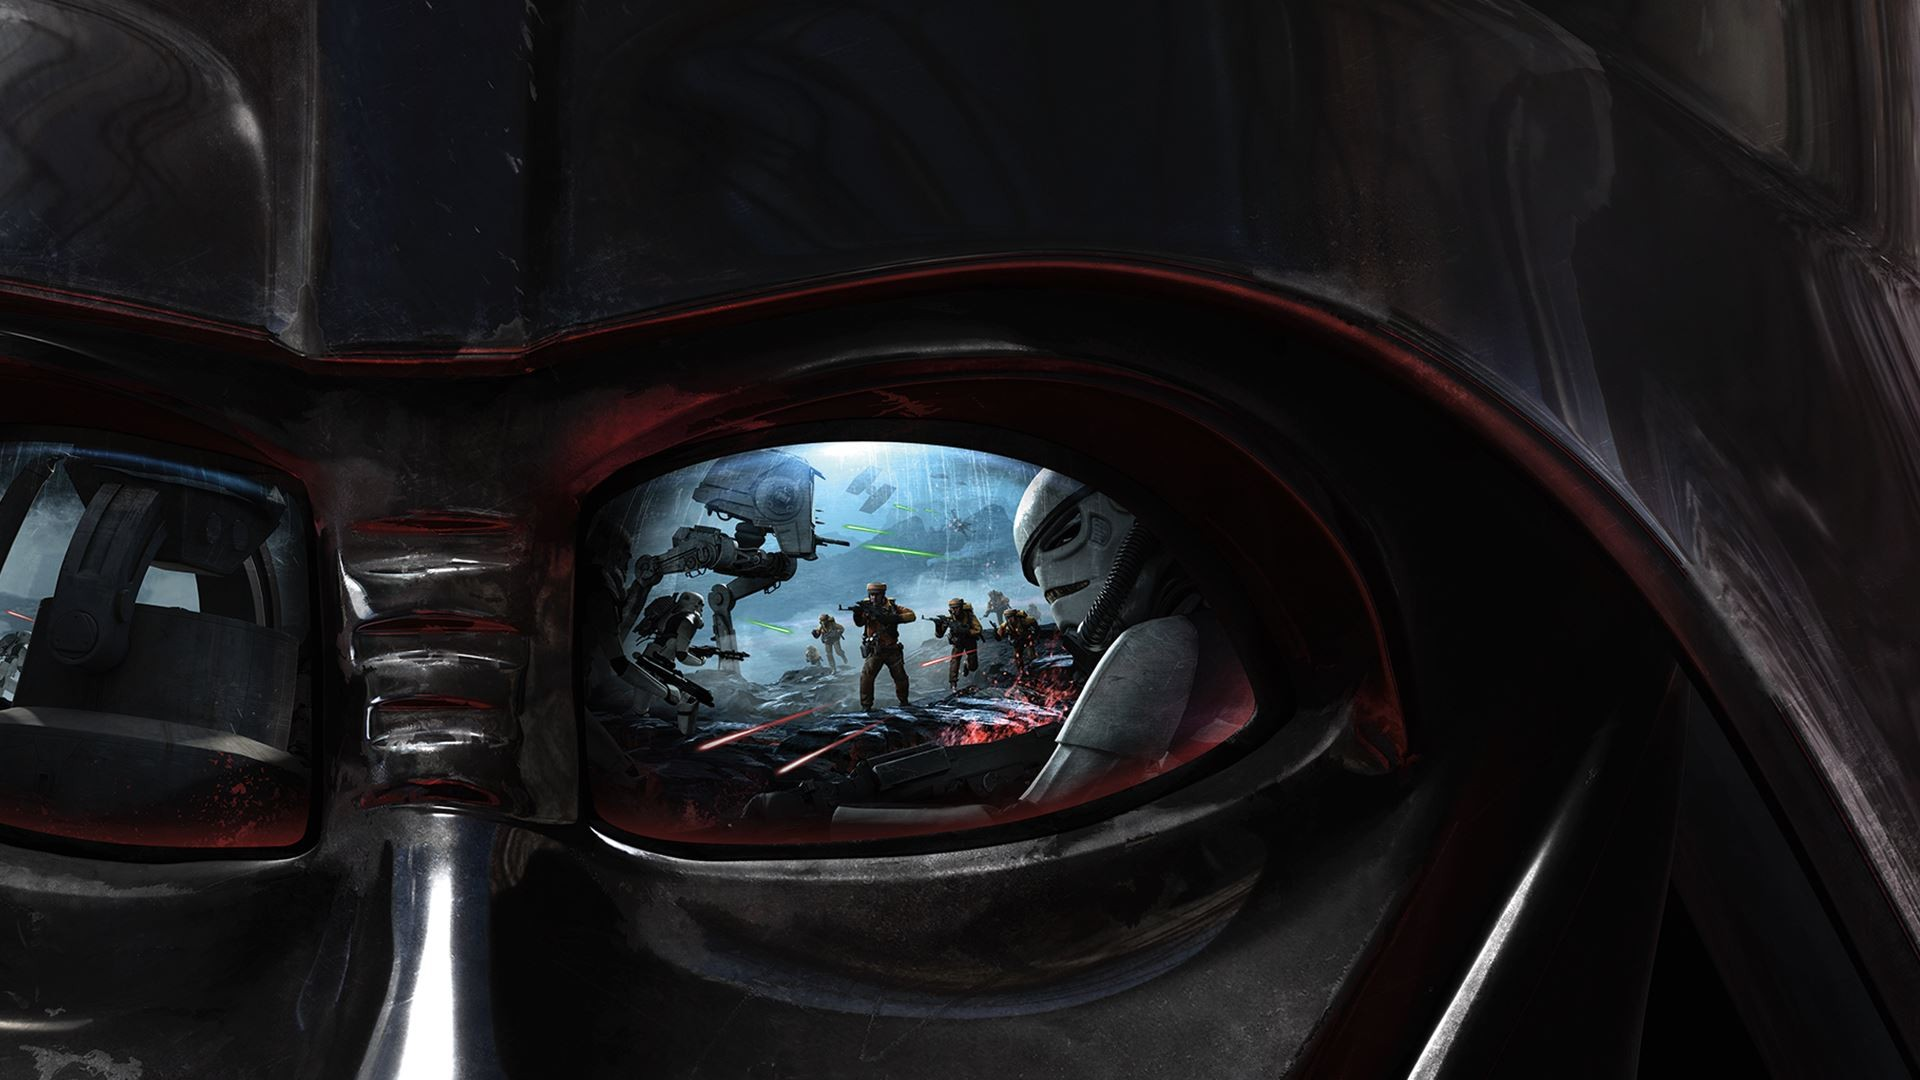 1366x768 Darth Vader Artwork 1366x768 Resolution HD 4k Wallpapers